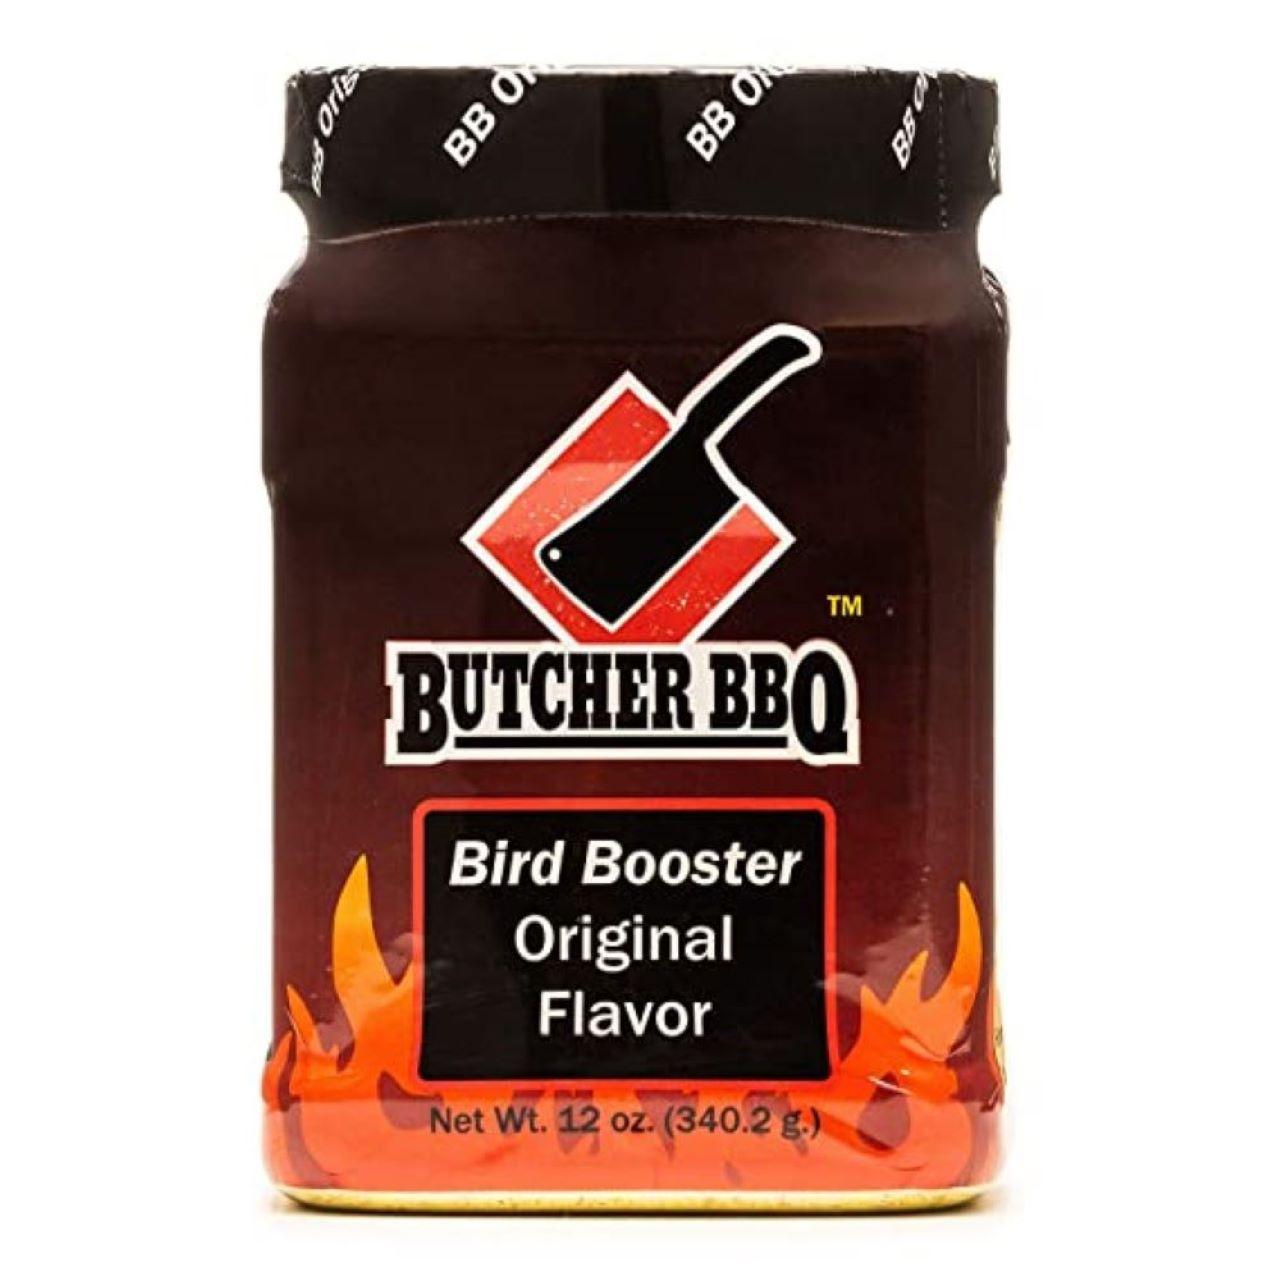 Butcher BBQ 12oz Bird Booster Original Flavor Powder Injection Marinade